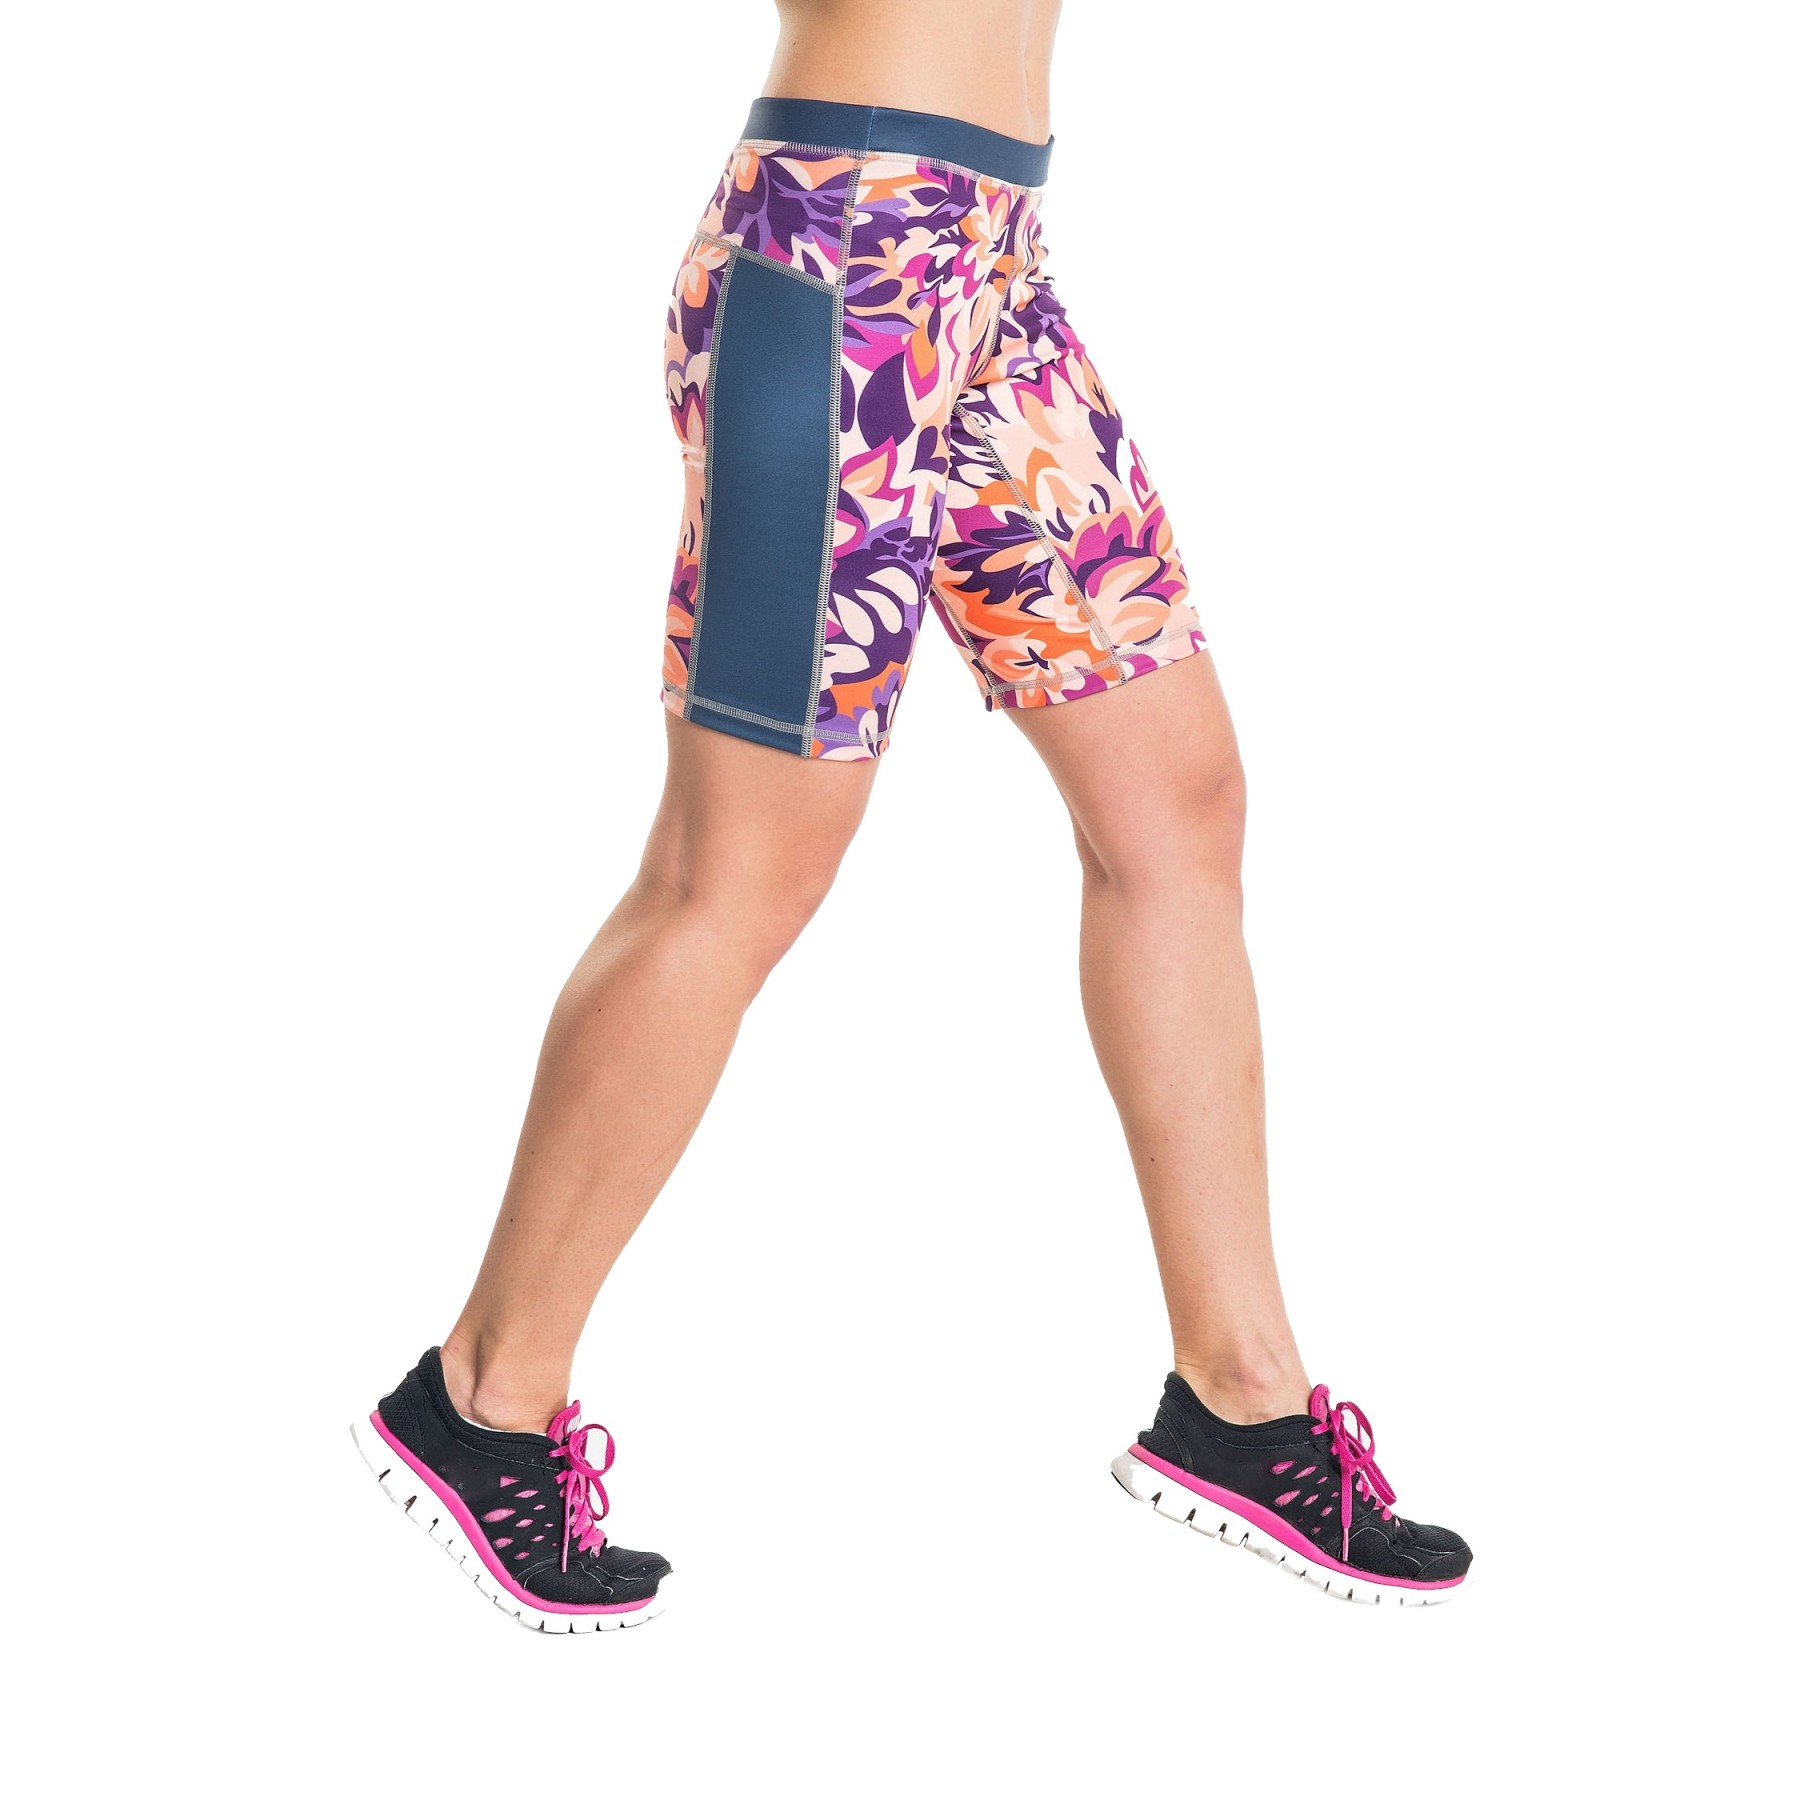 Damen Flowers Fitnesshose Violet Leggings Kurze Short Laufhose Nessi Oskk A4RL5j